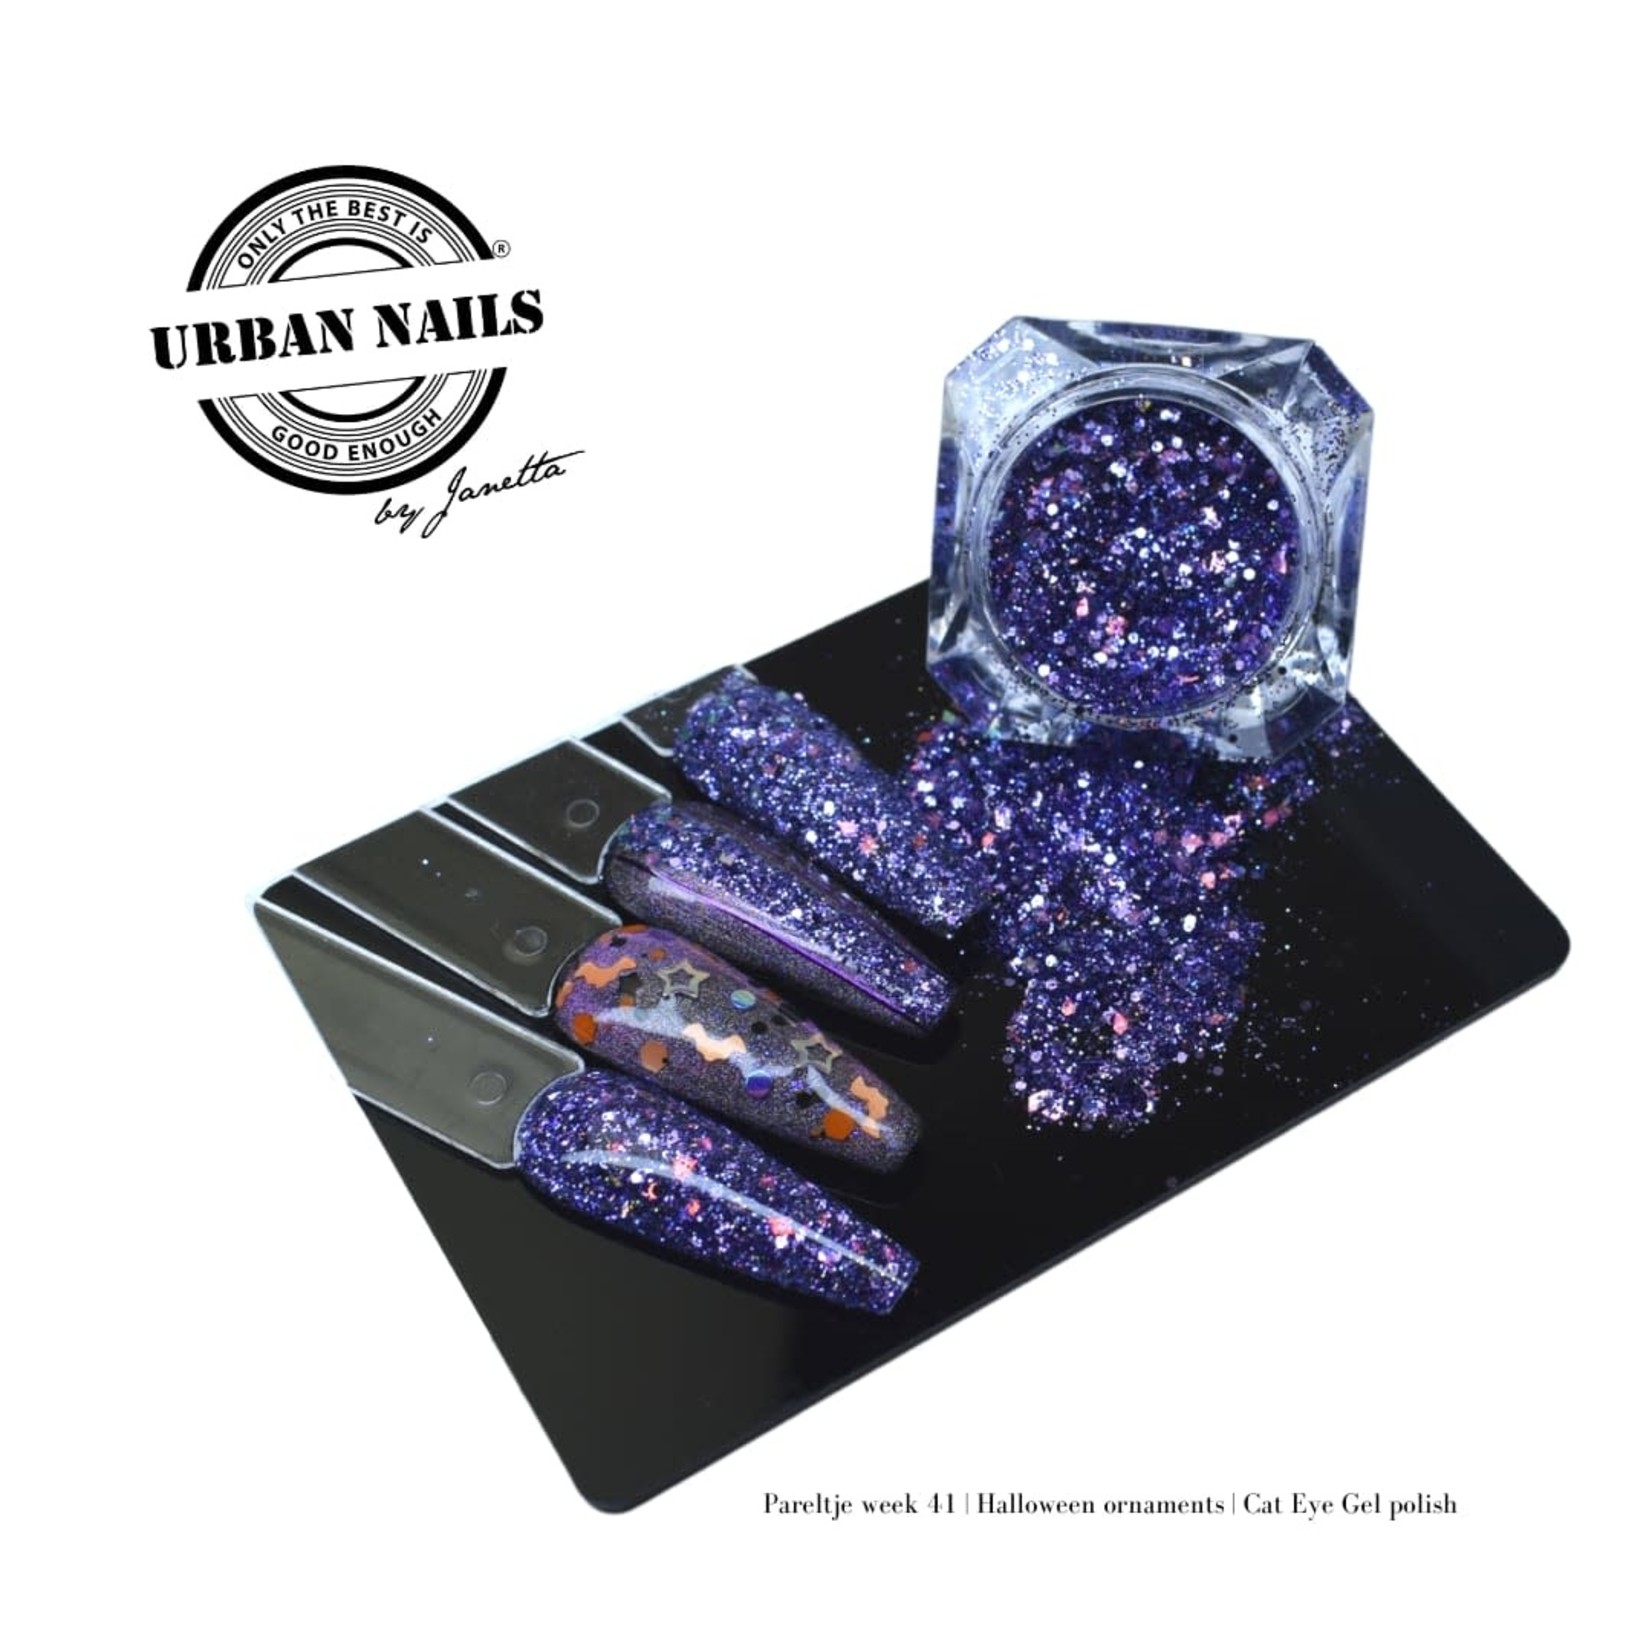 Urban Nails Pareltje van de Week 41 | Blauwe paars glitter